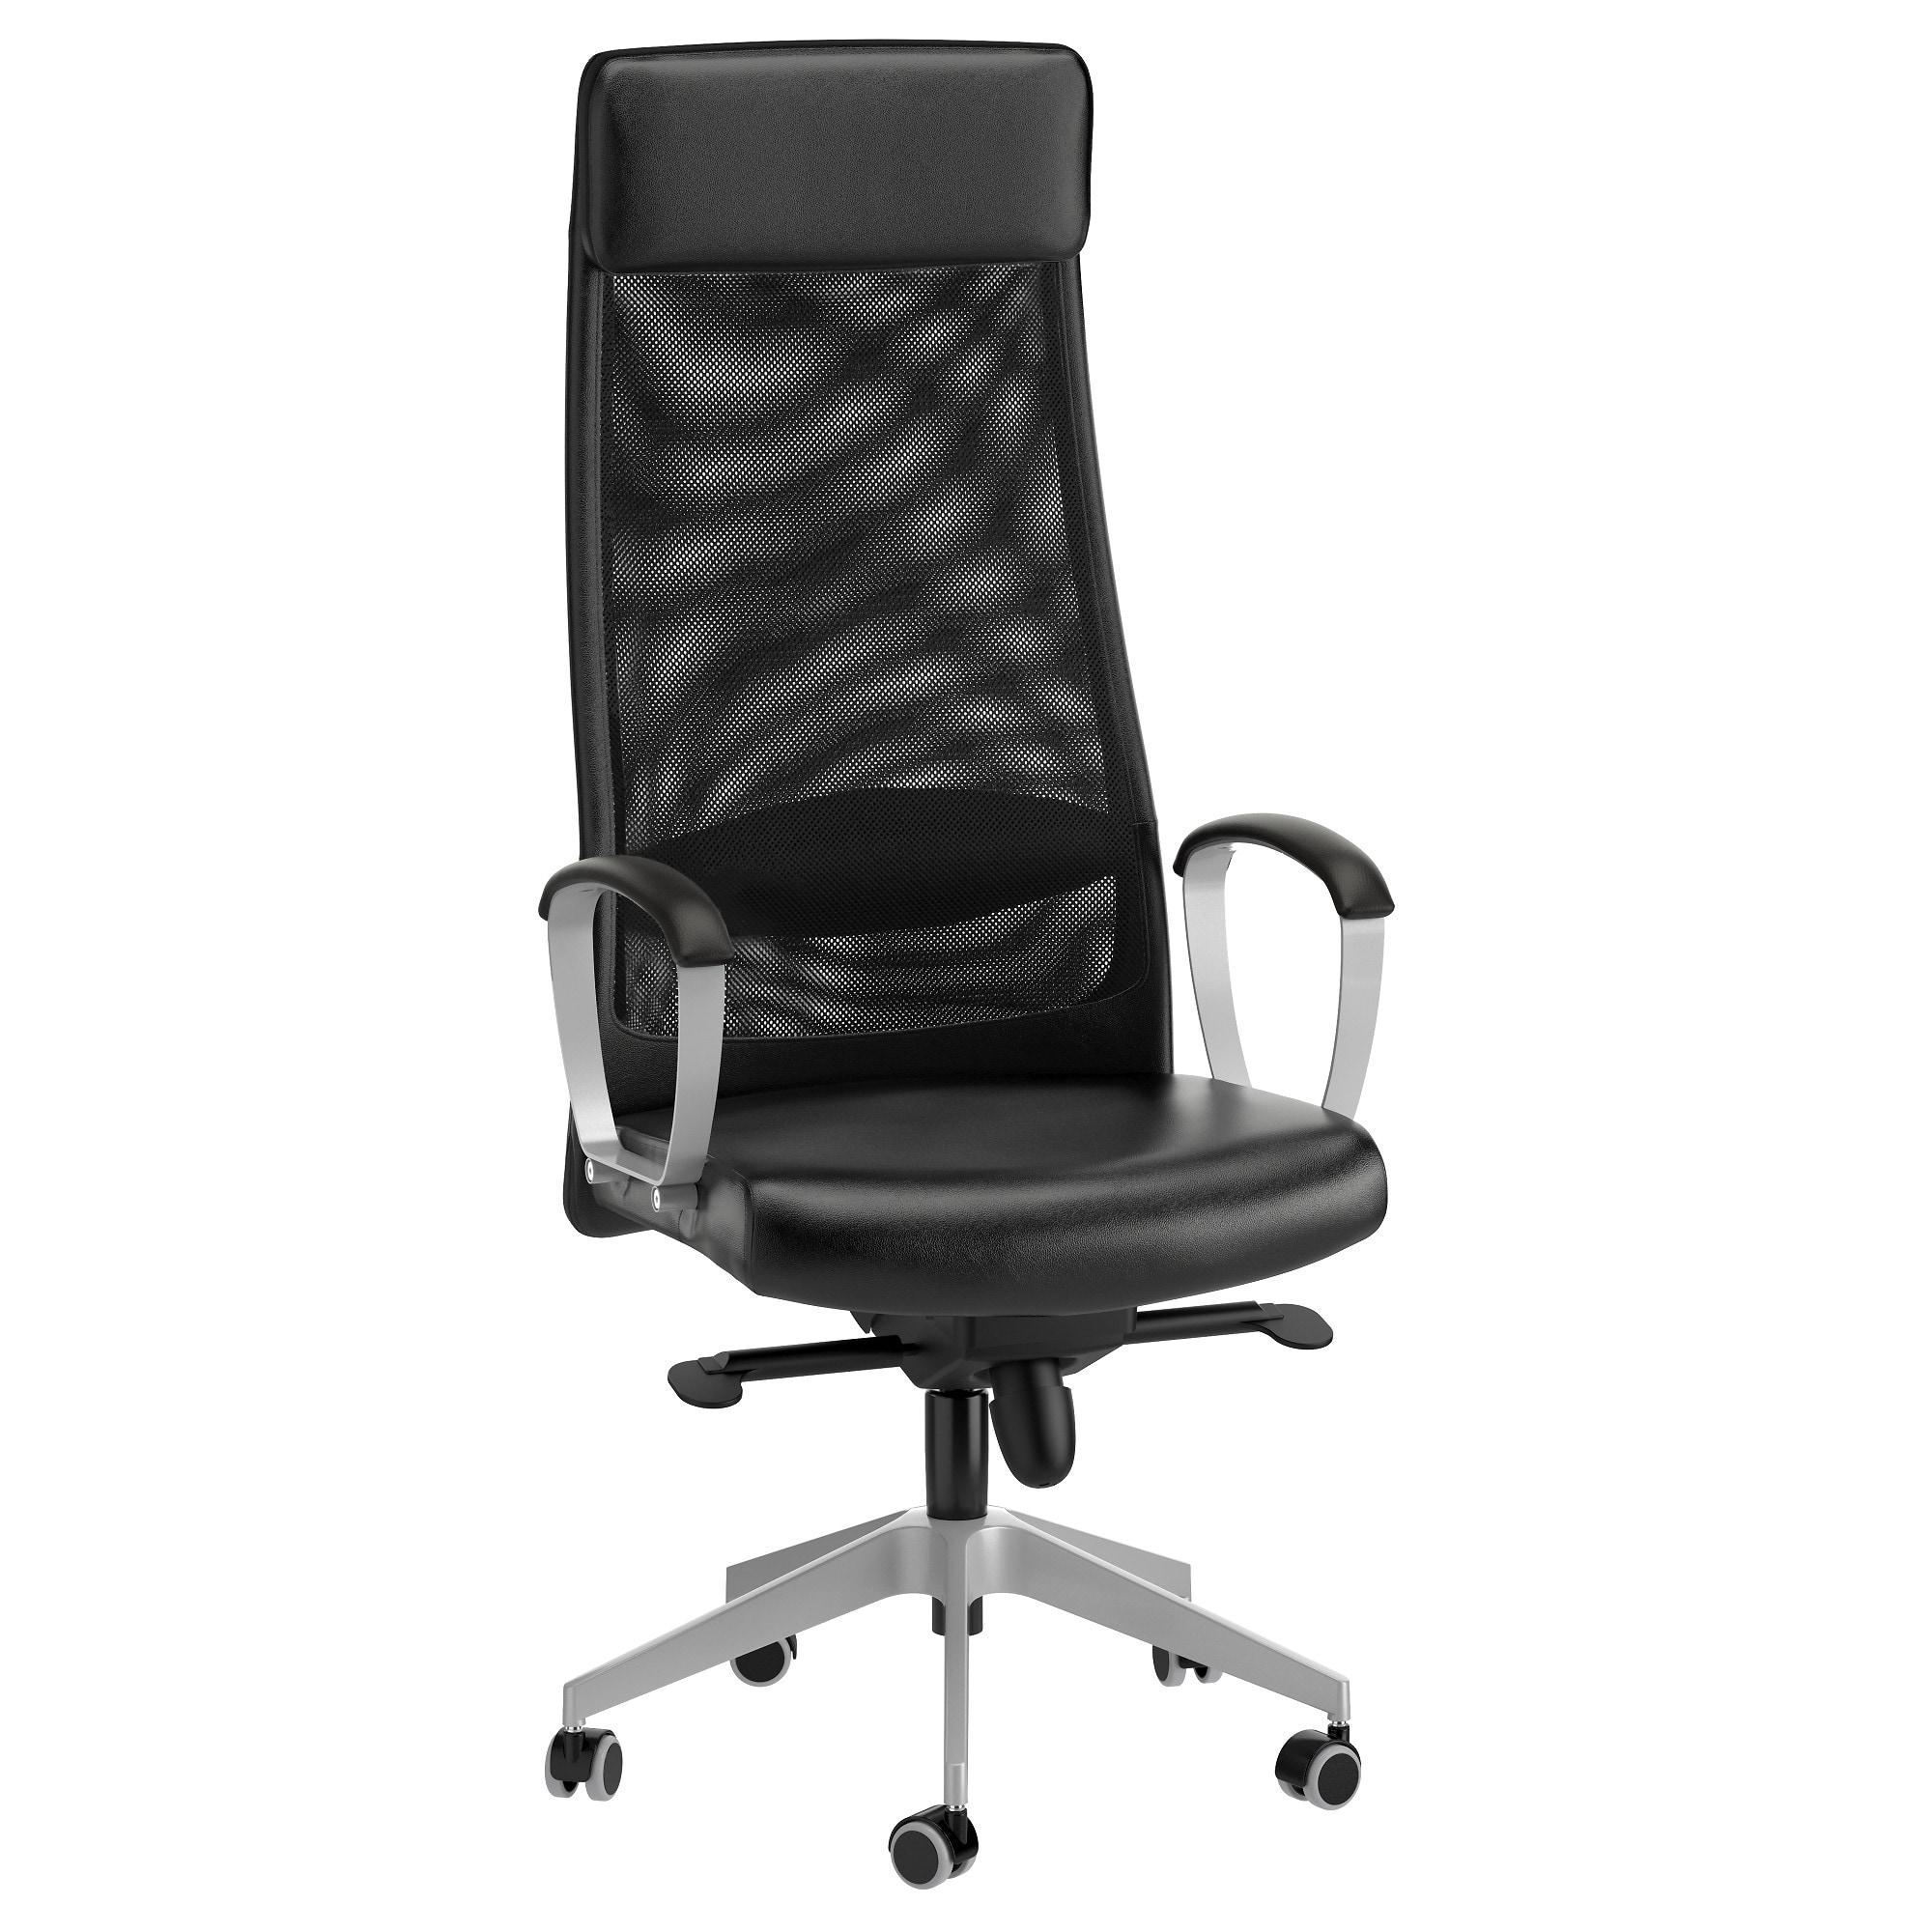 Sillas Oficina Ikea 8ydm Markus Swivel Chair Glose Black Ikea ...